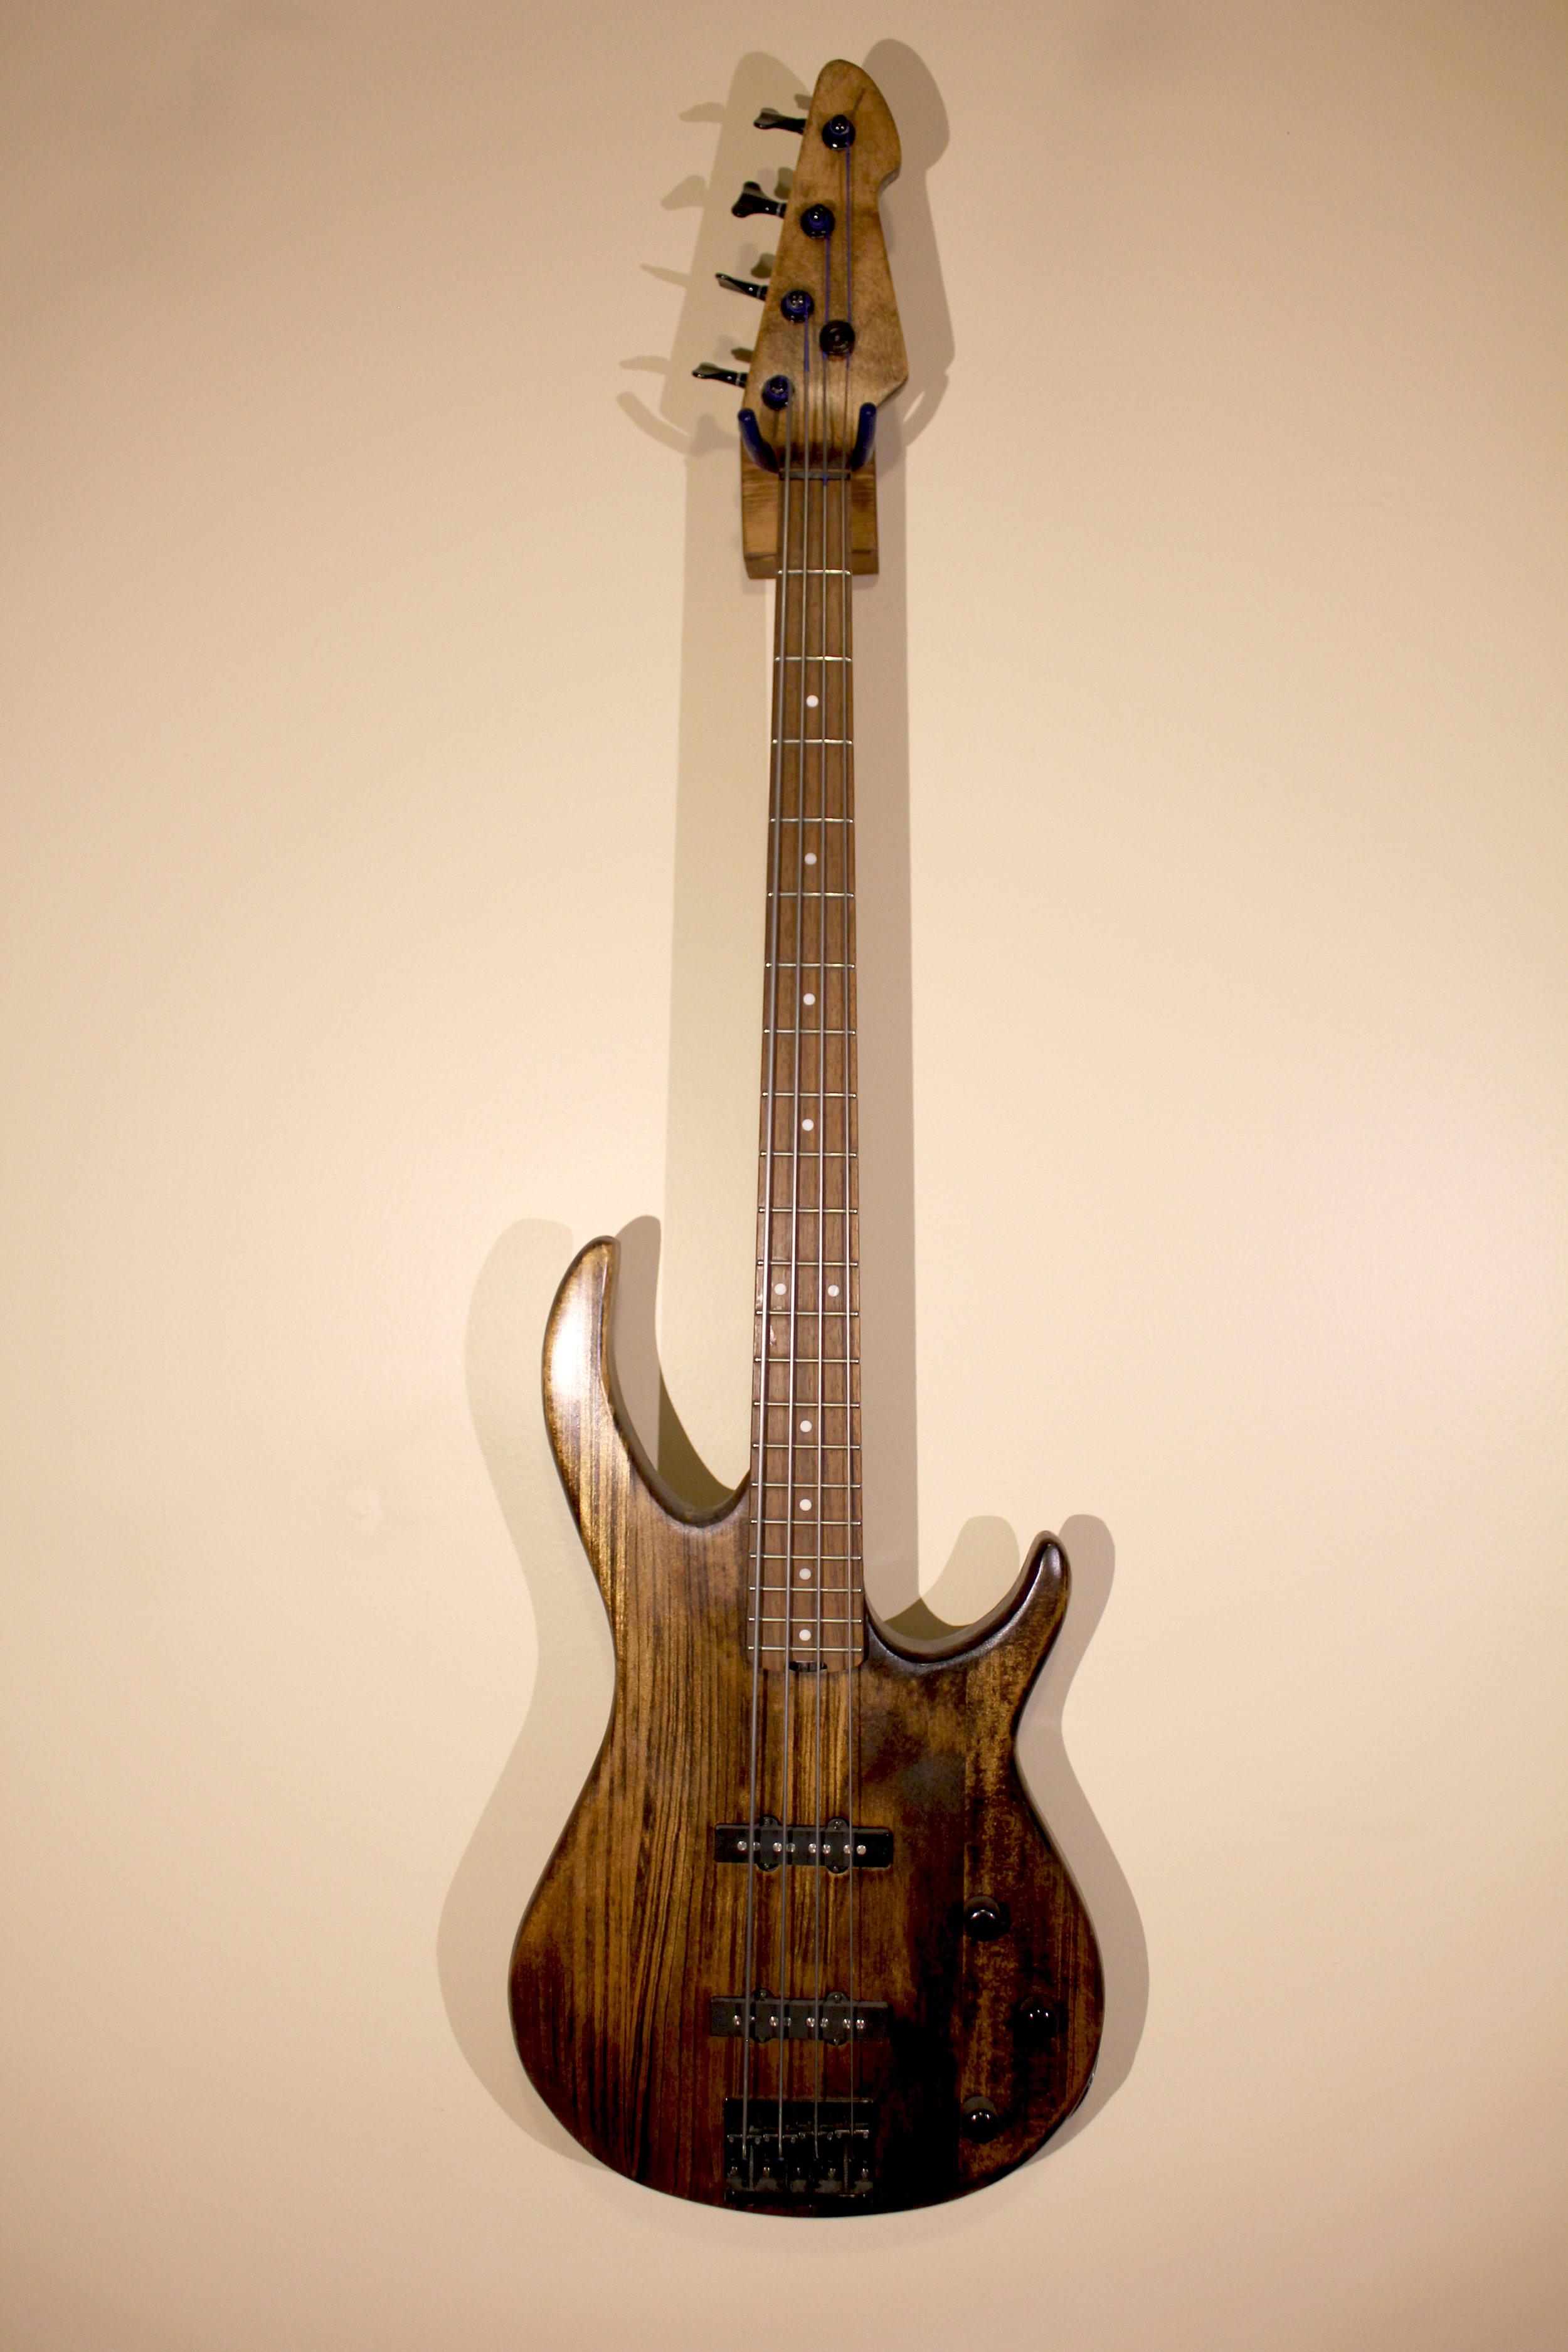 Bass Custom   -not for sale- ibanez bass, woodstain, sealer